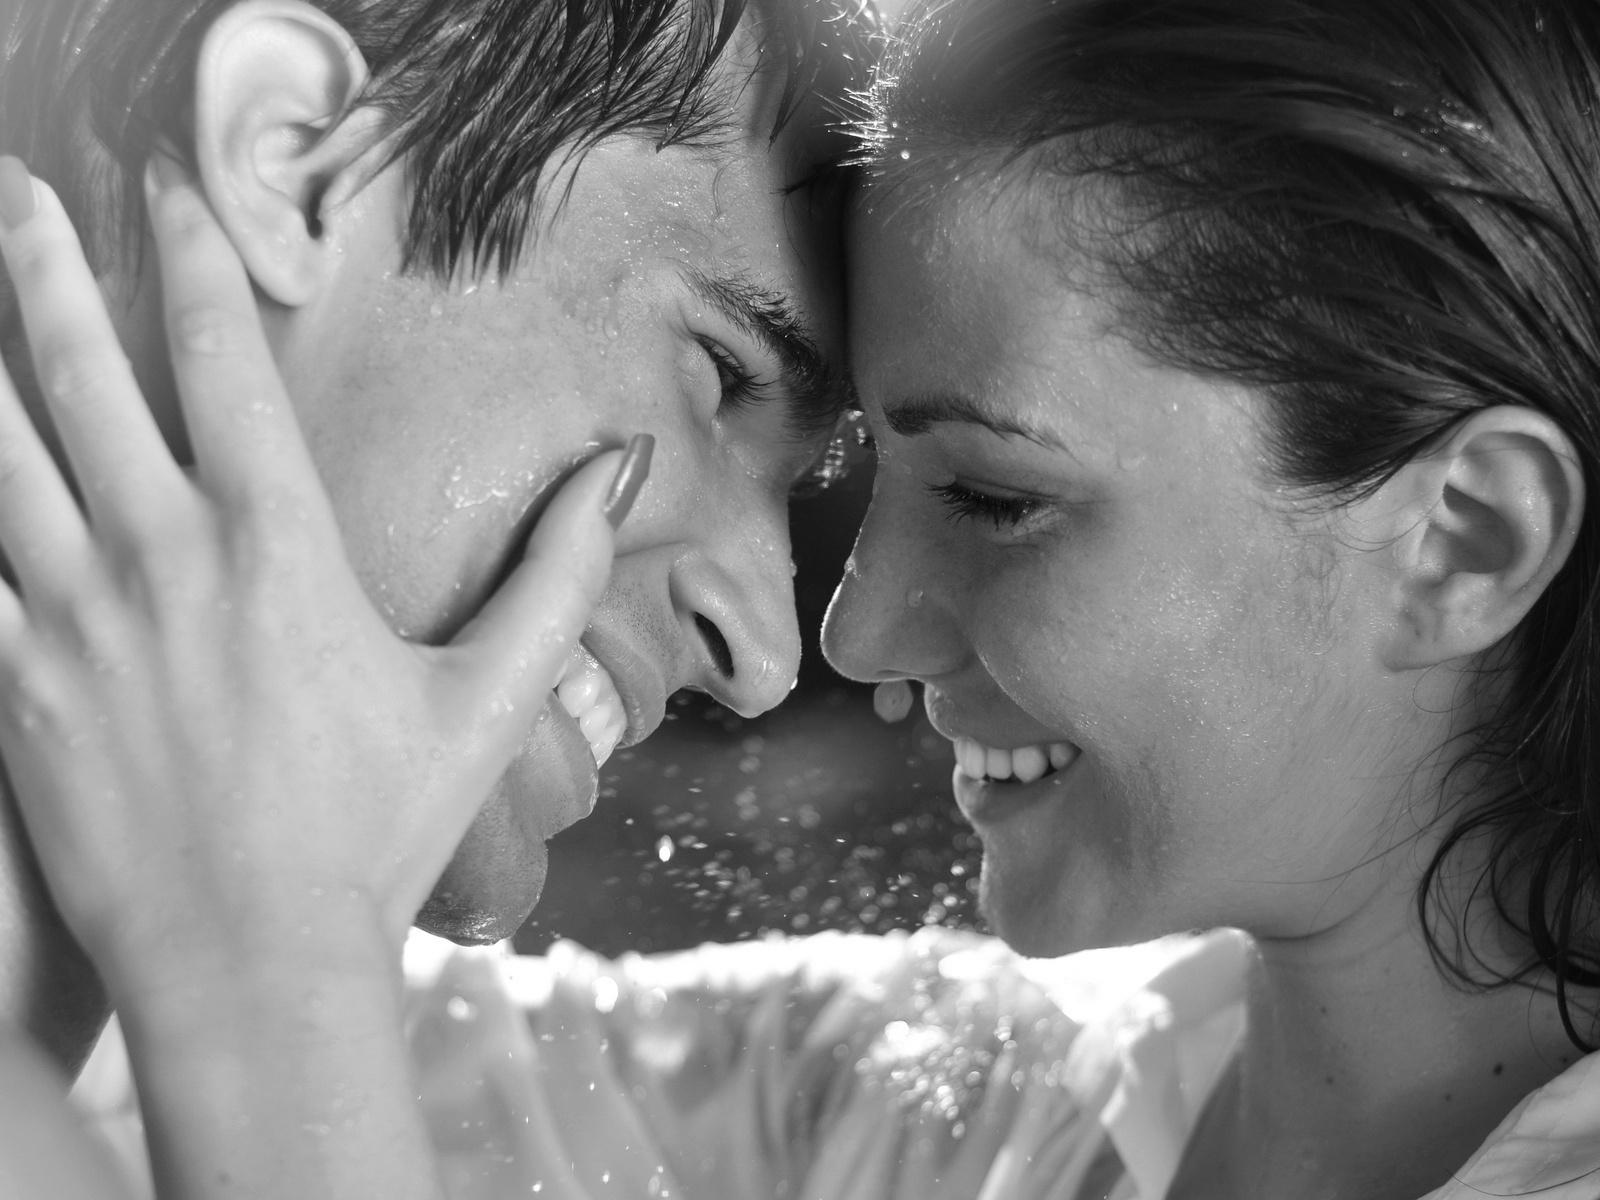 Романтика чувства любовь